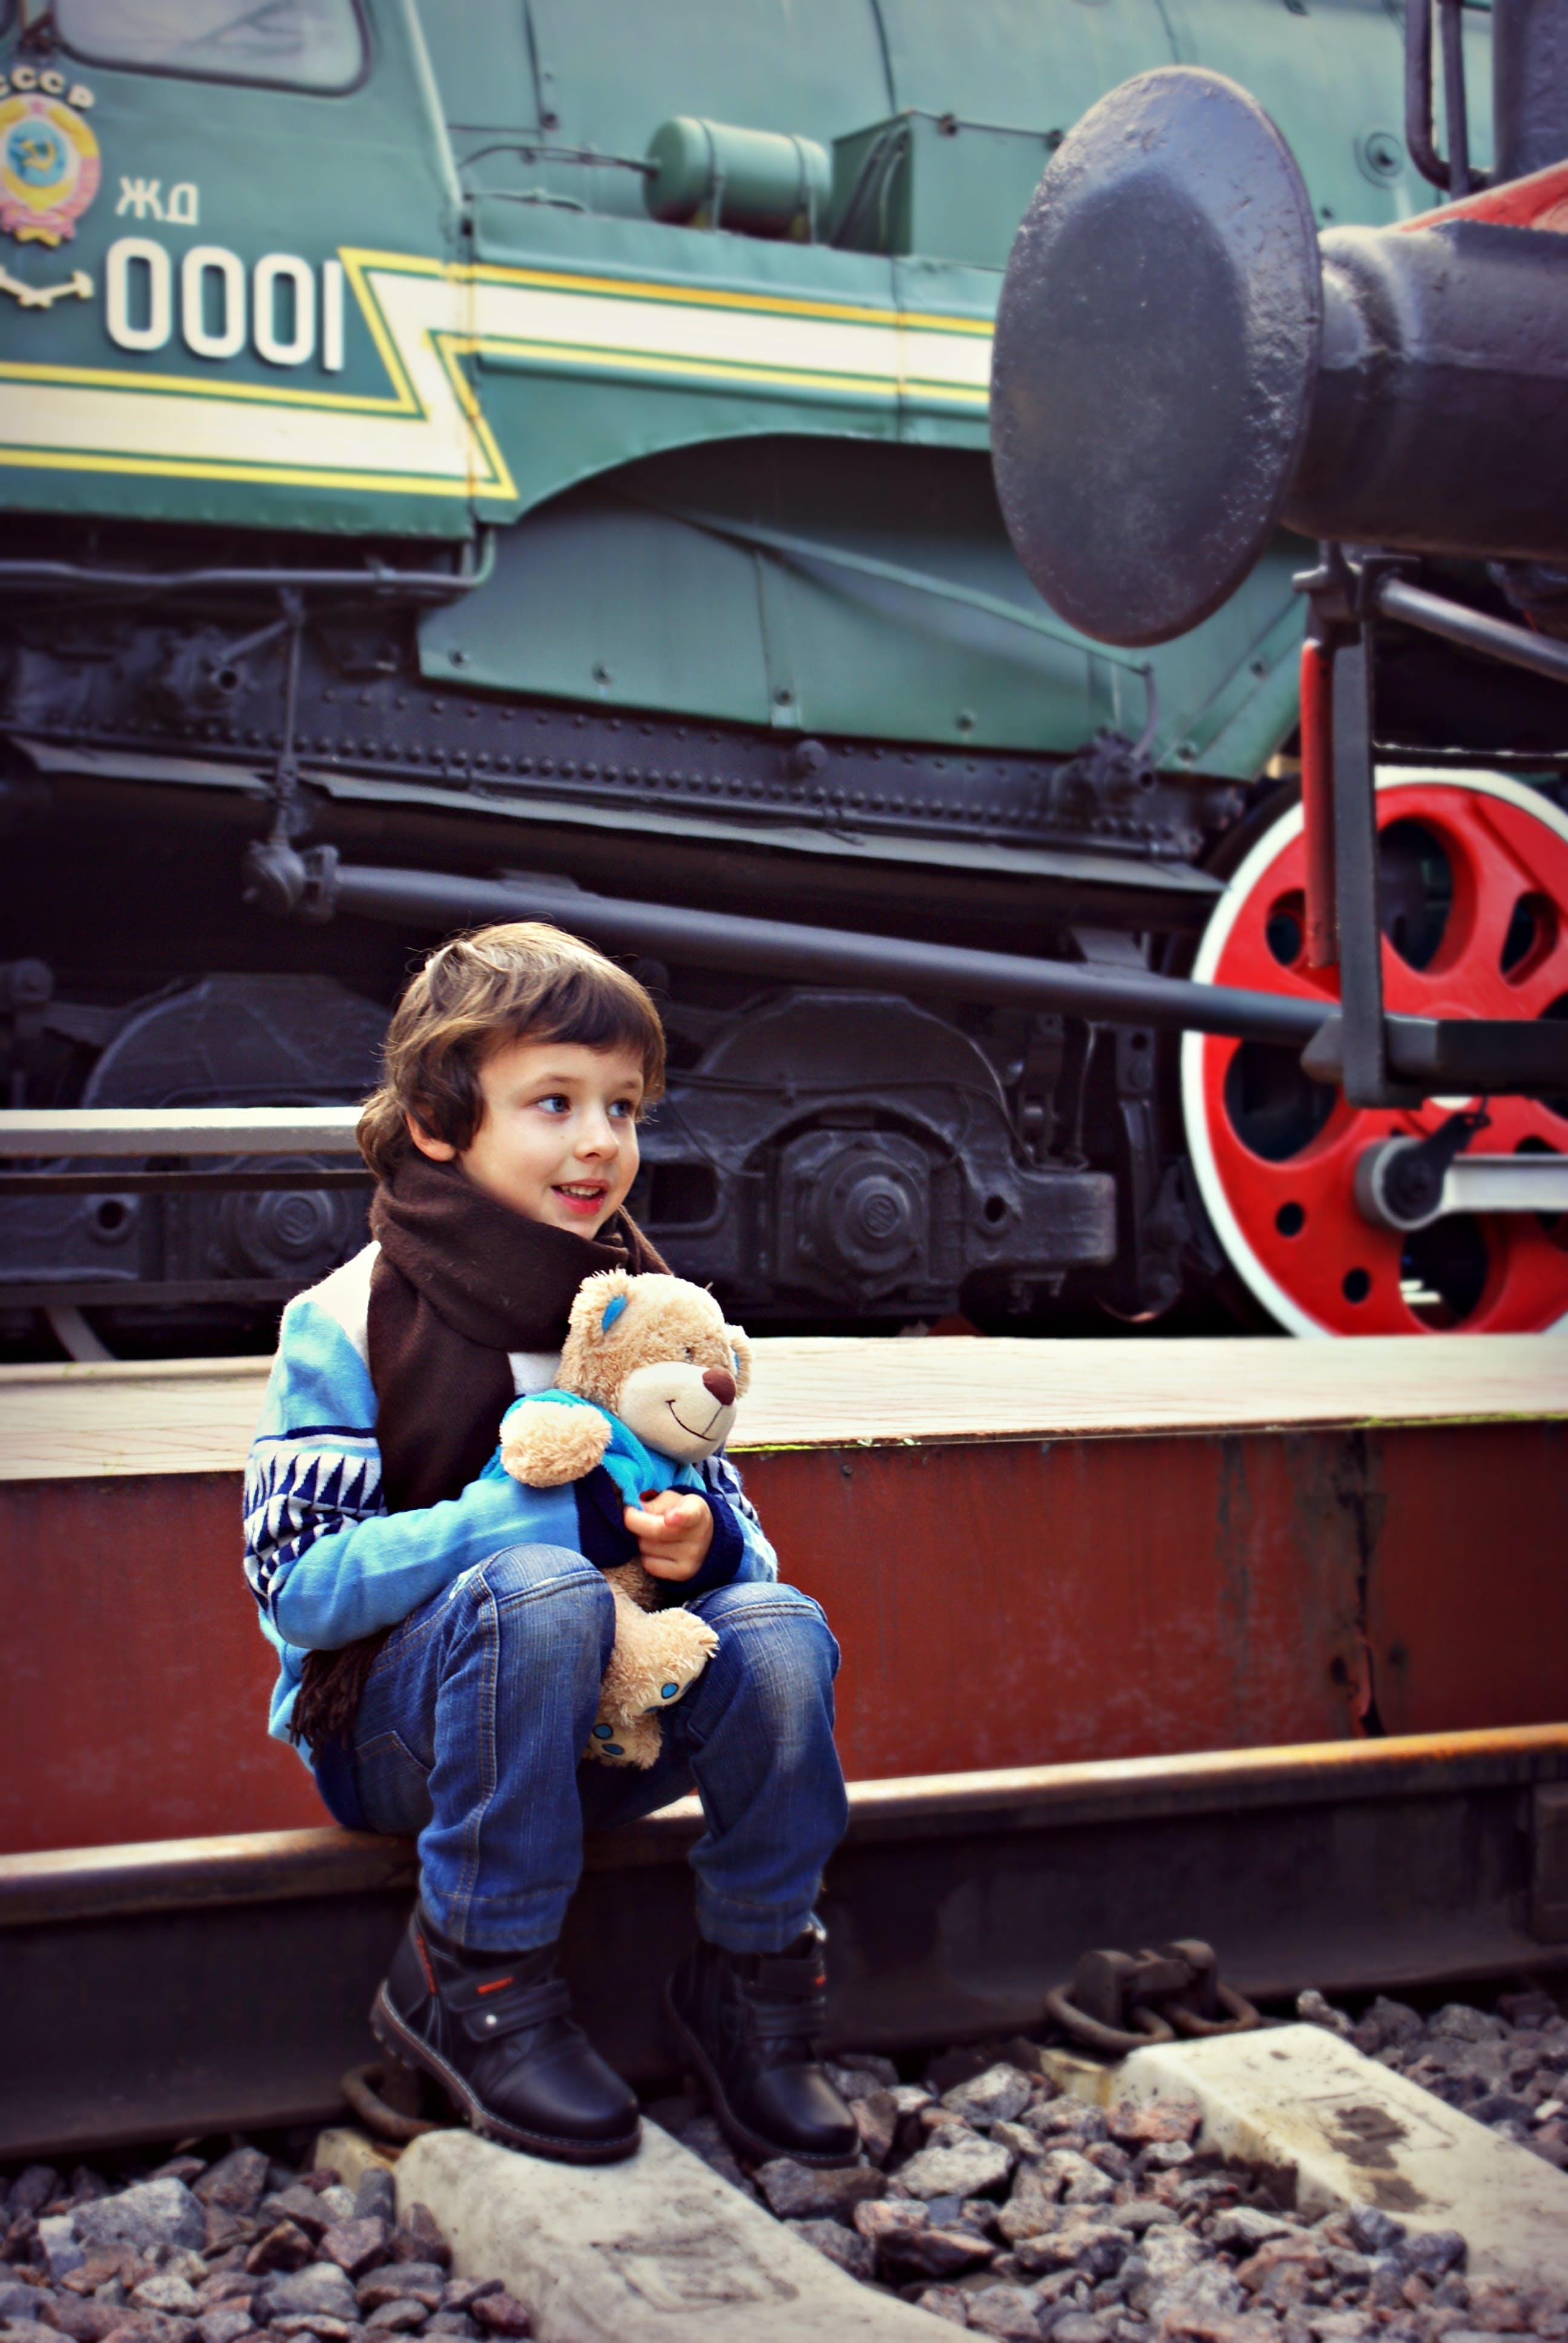 Boy Sitting Near Train While Holding Bear Plush Toy